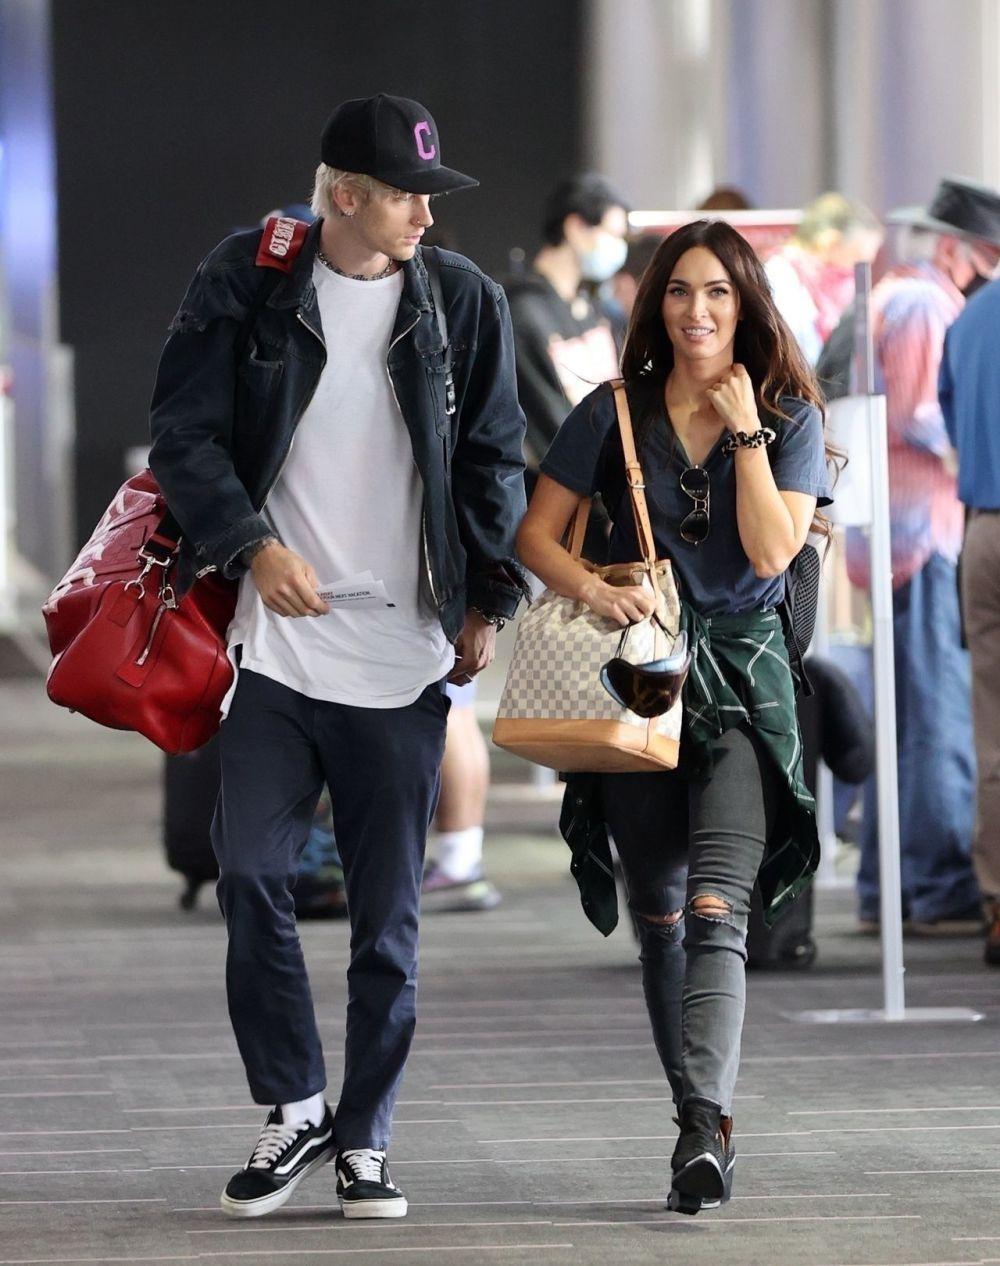 Machine Gun Kelly and Megan Fox at the airport